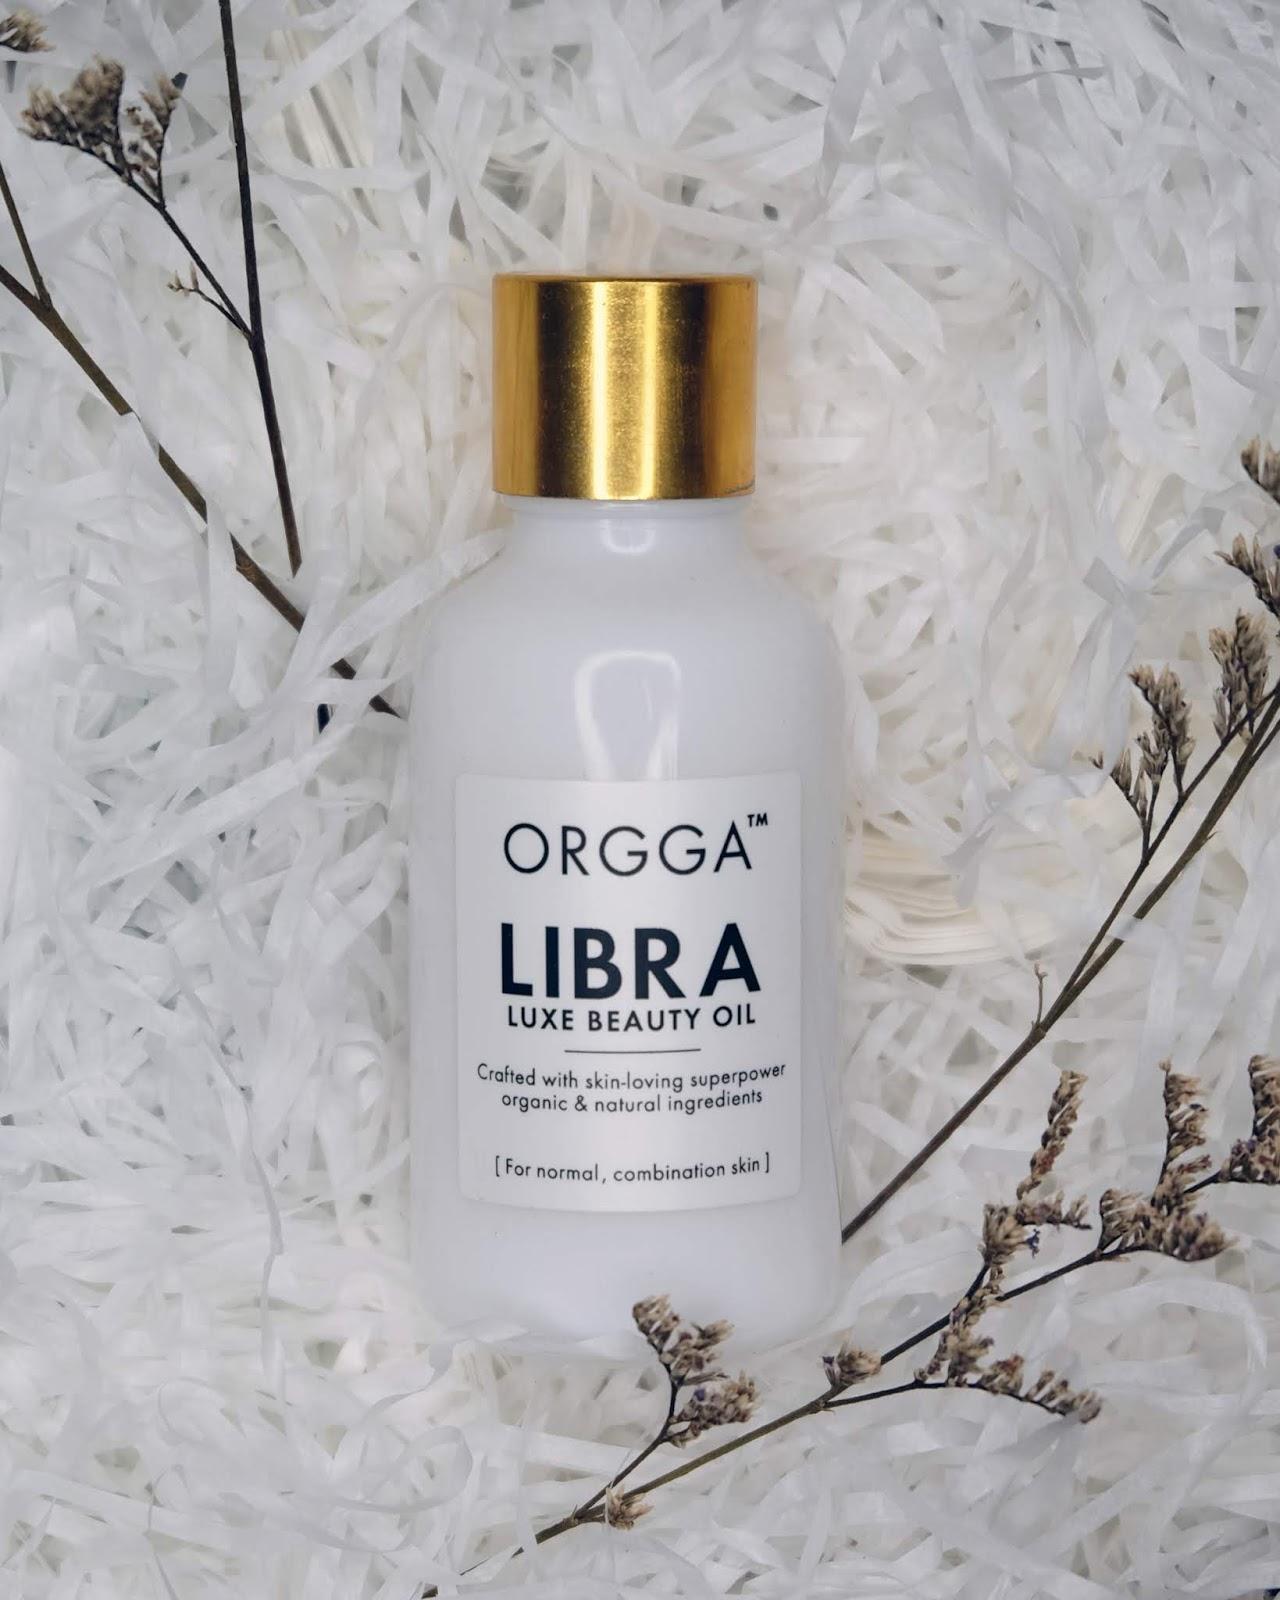 Libra Luxe Beauty Oil Orgga Curitan Aqalili